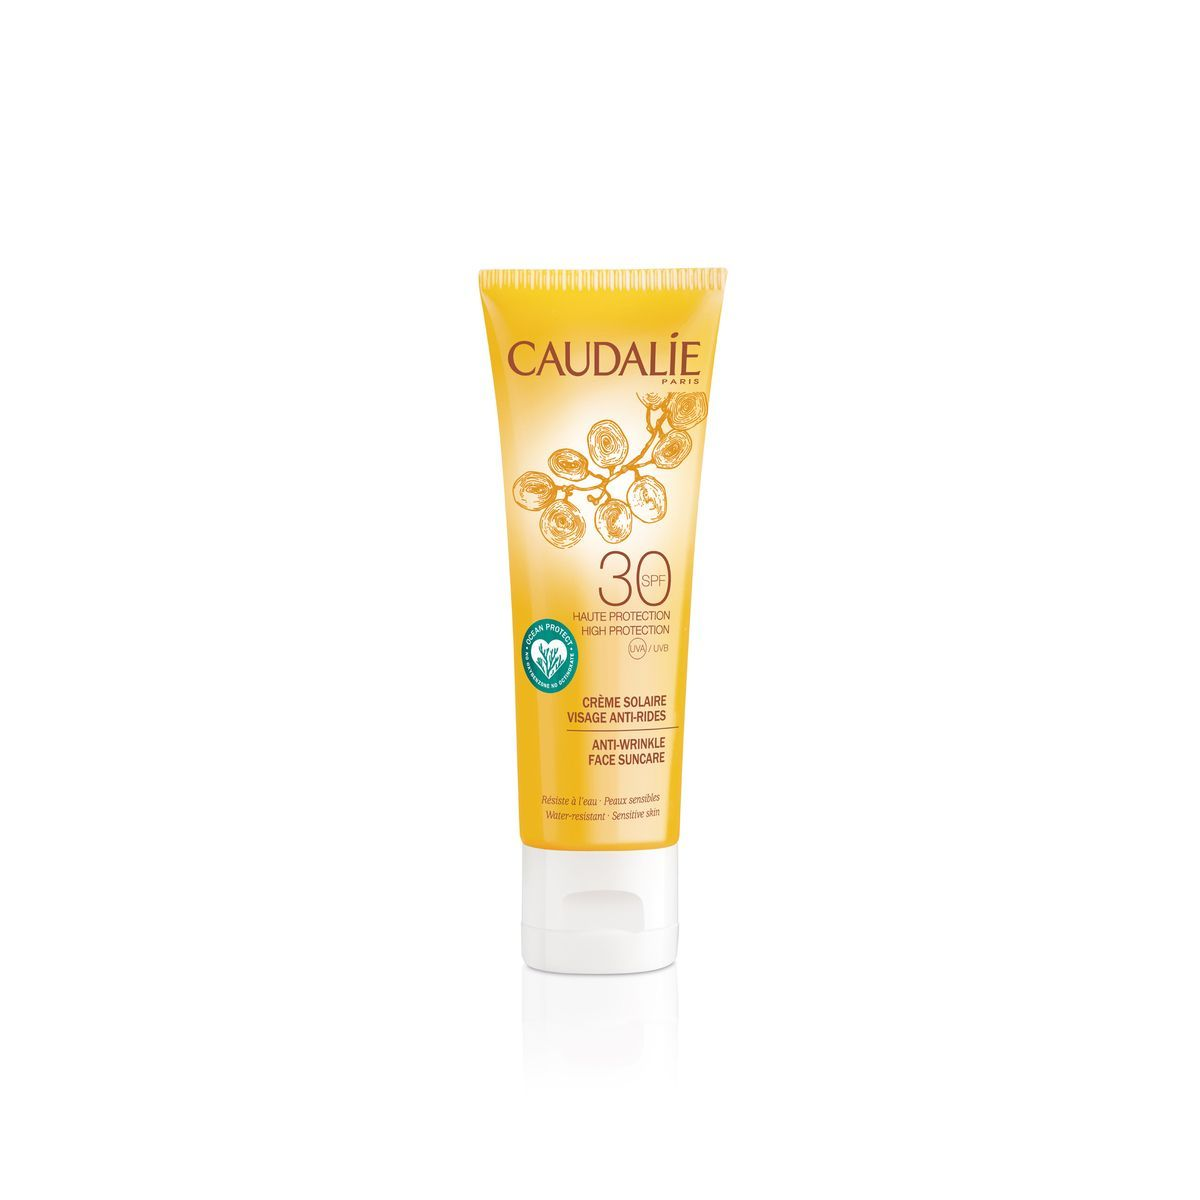 Caudalie Anti-wrinkle Face Suncare SPF 30 50ml